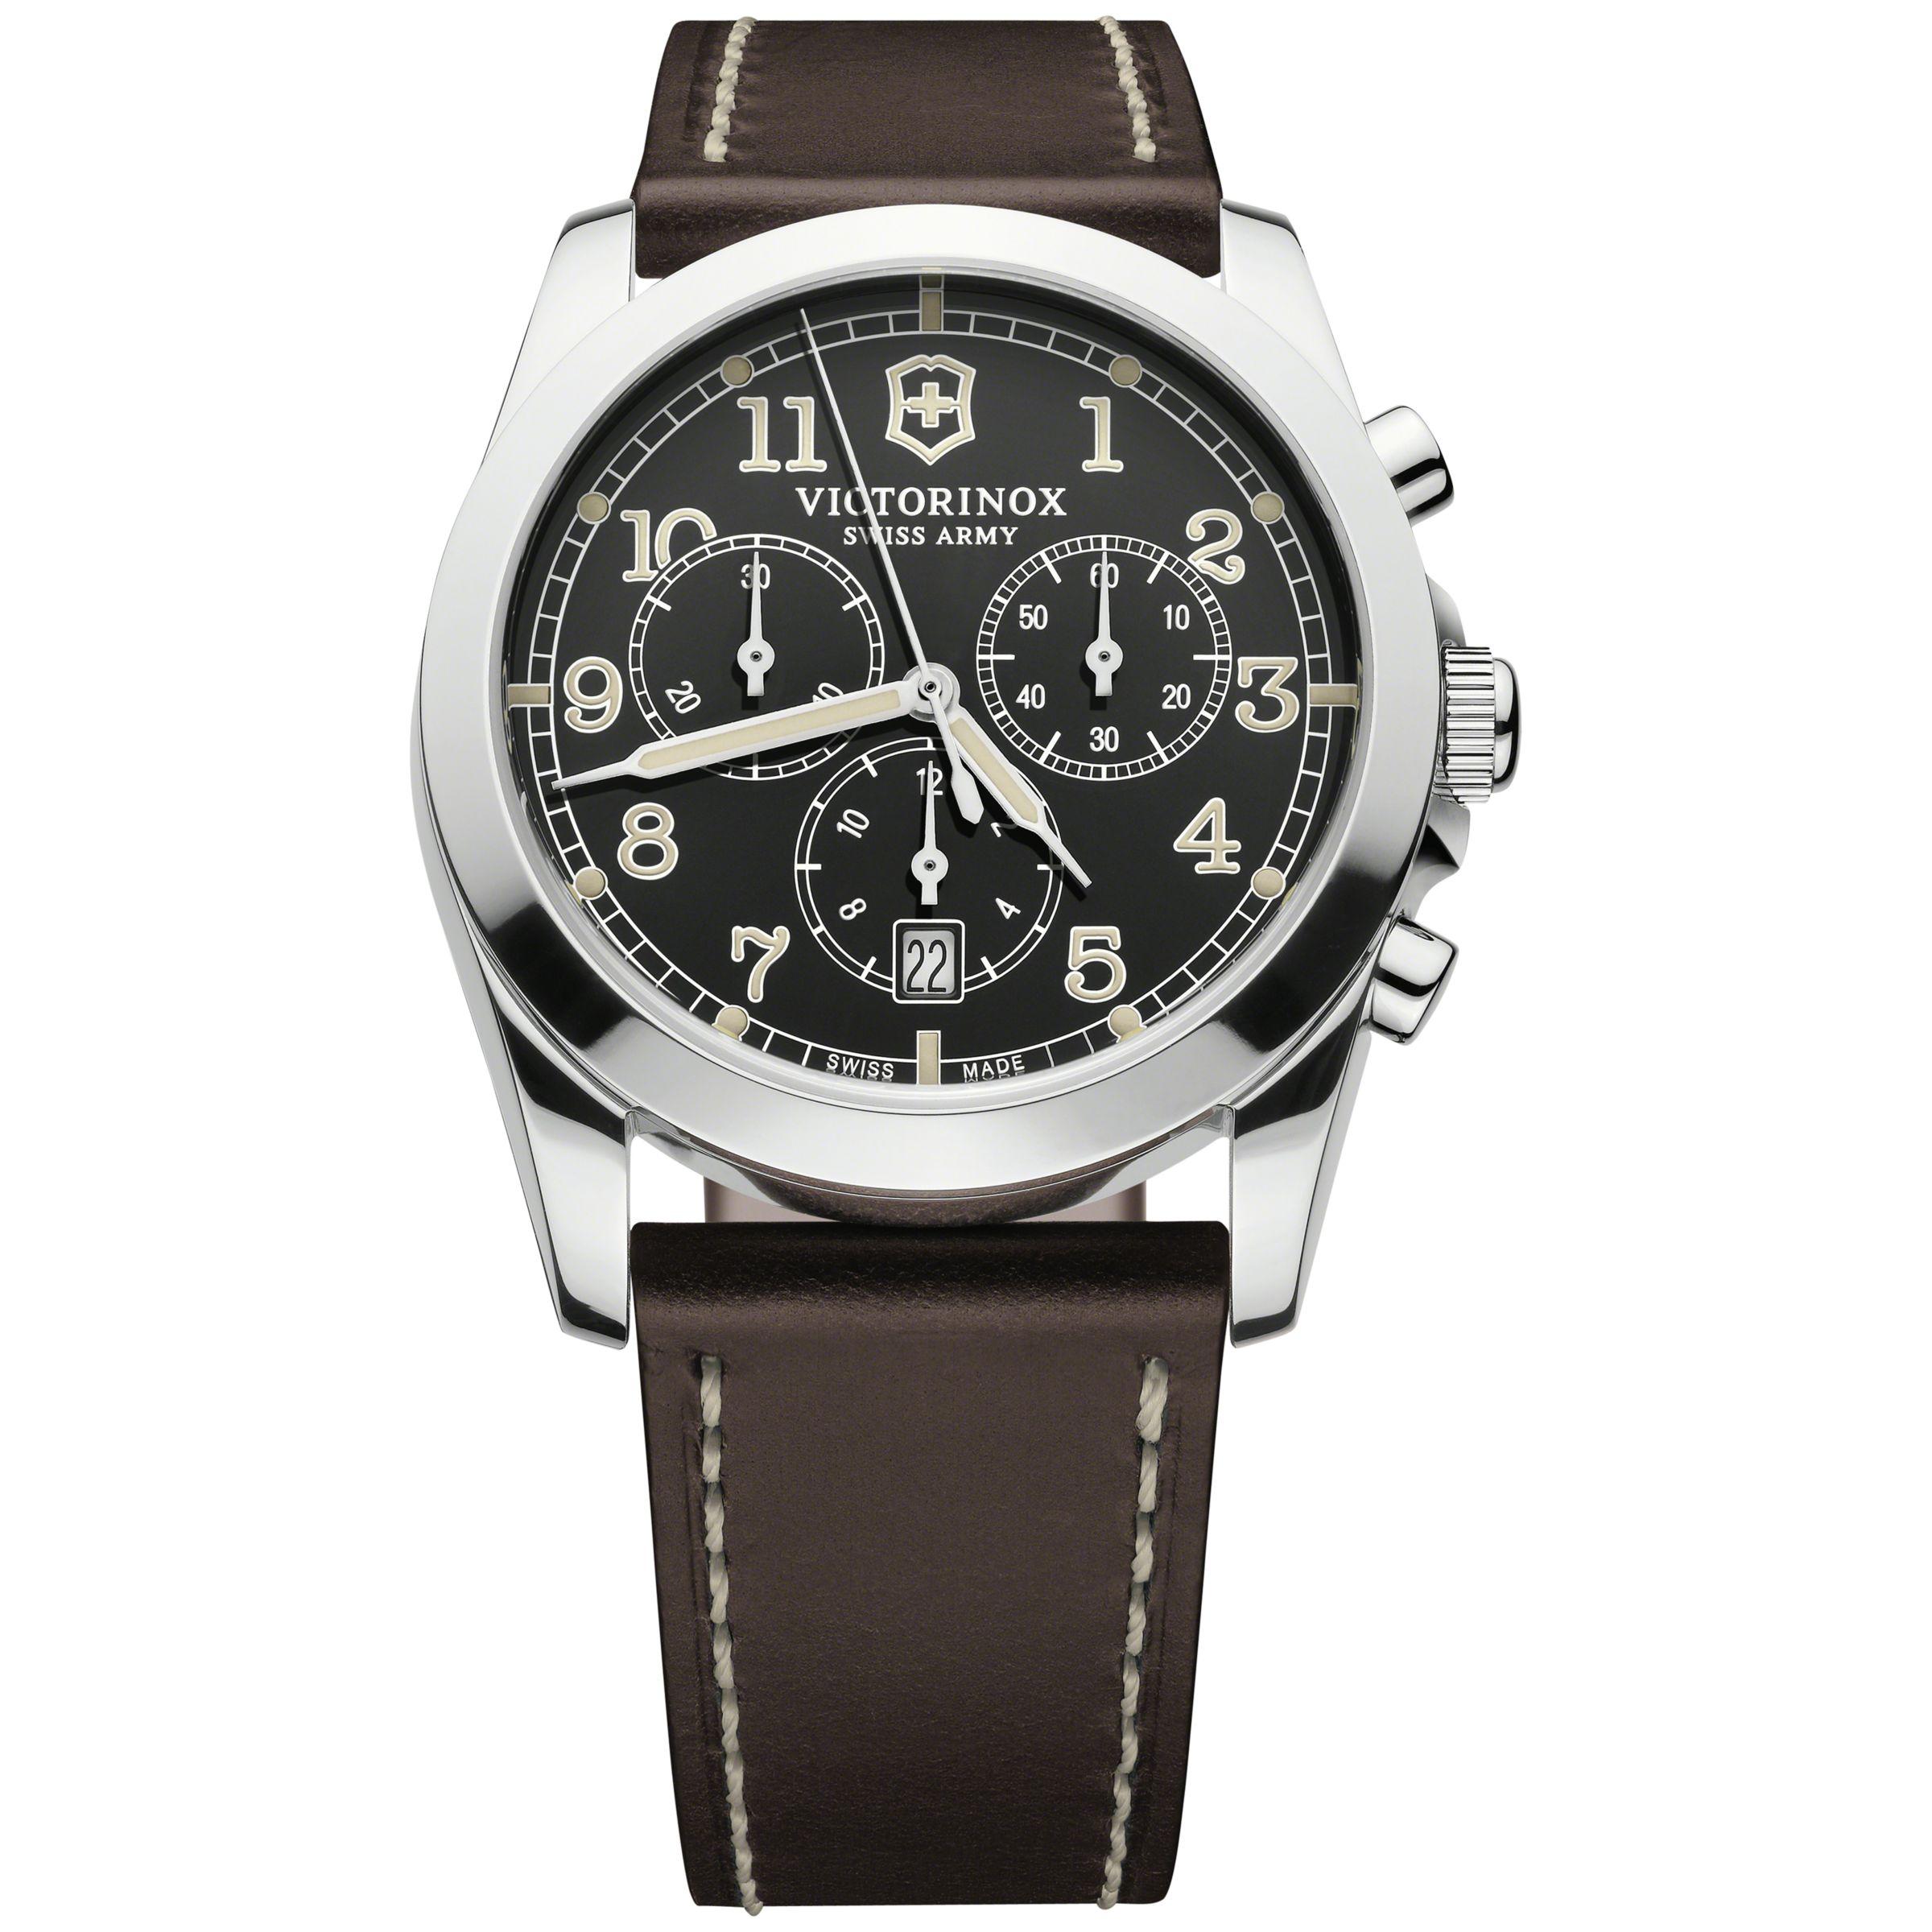 Victorinox Victorinox 242567 Men's Infantry Chronograph Leather Strap Watch, Brown/Black